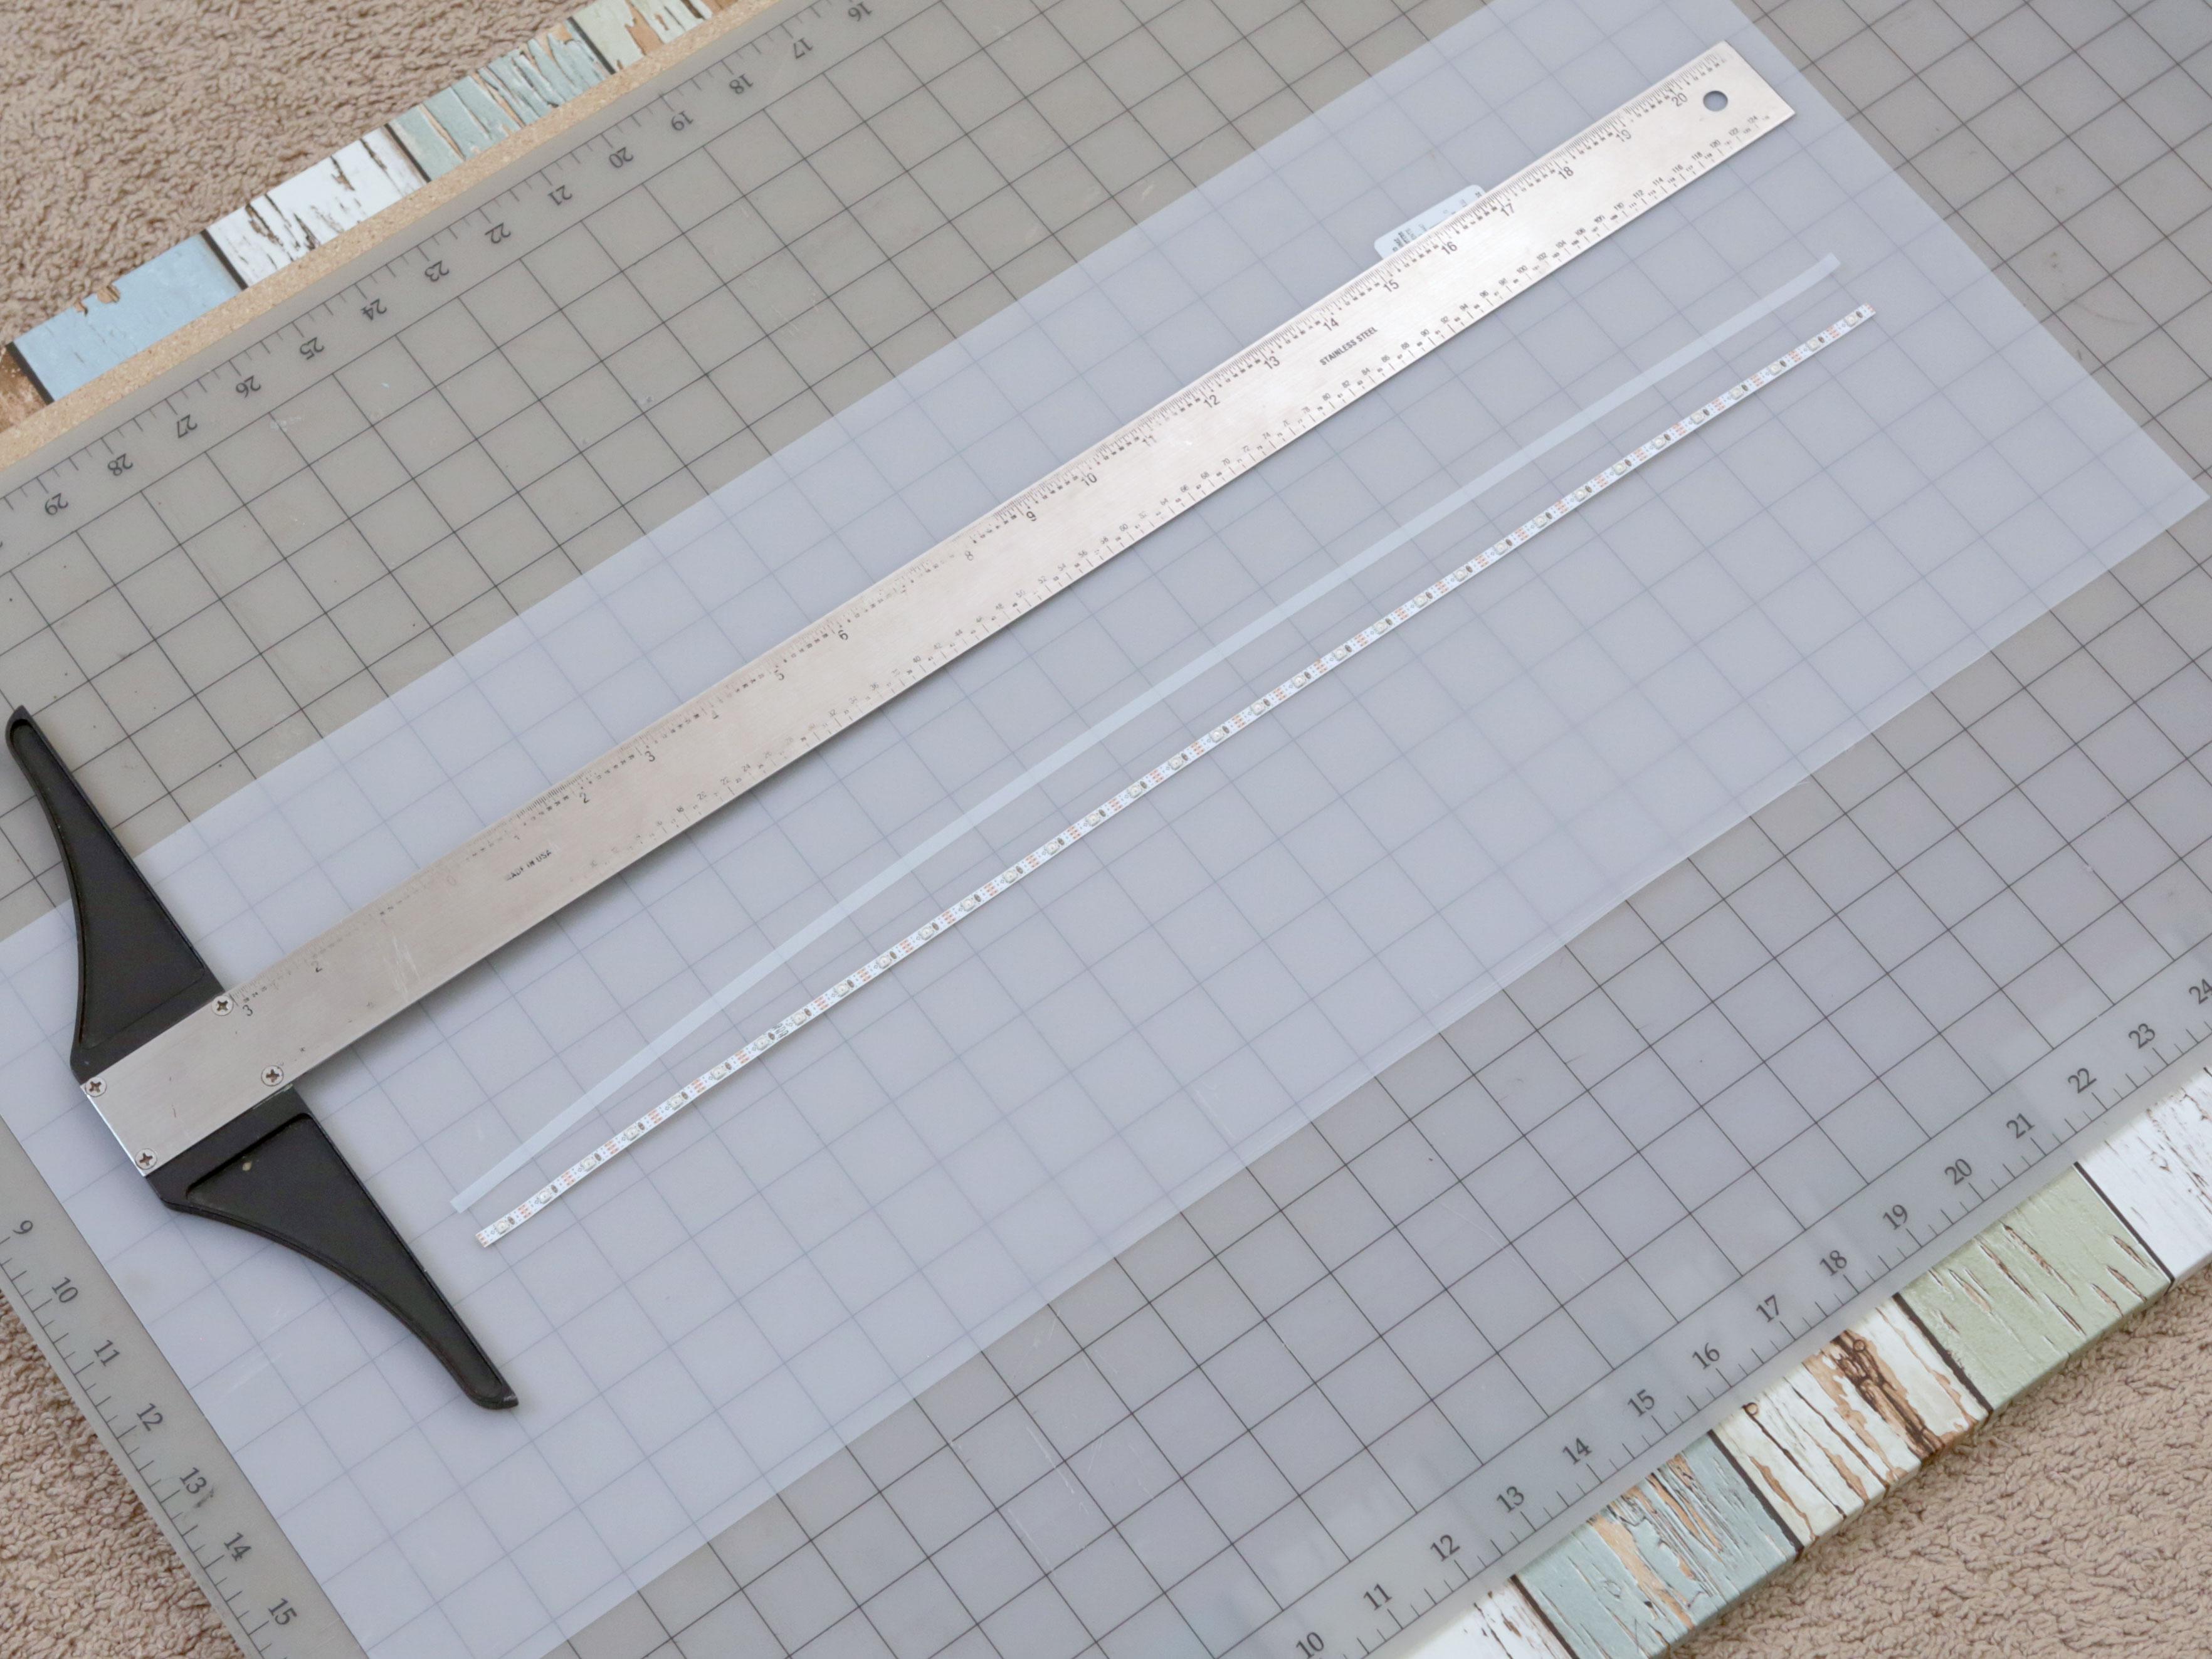 3d_printing_strip-insulator-cut.jpg